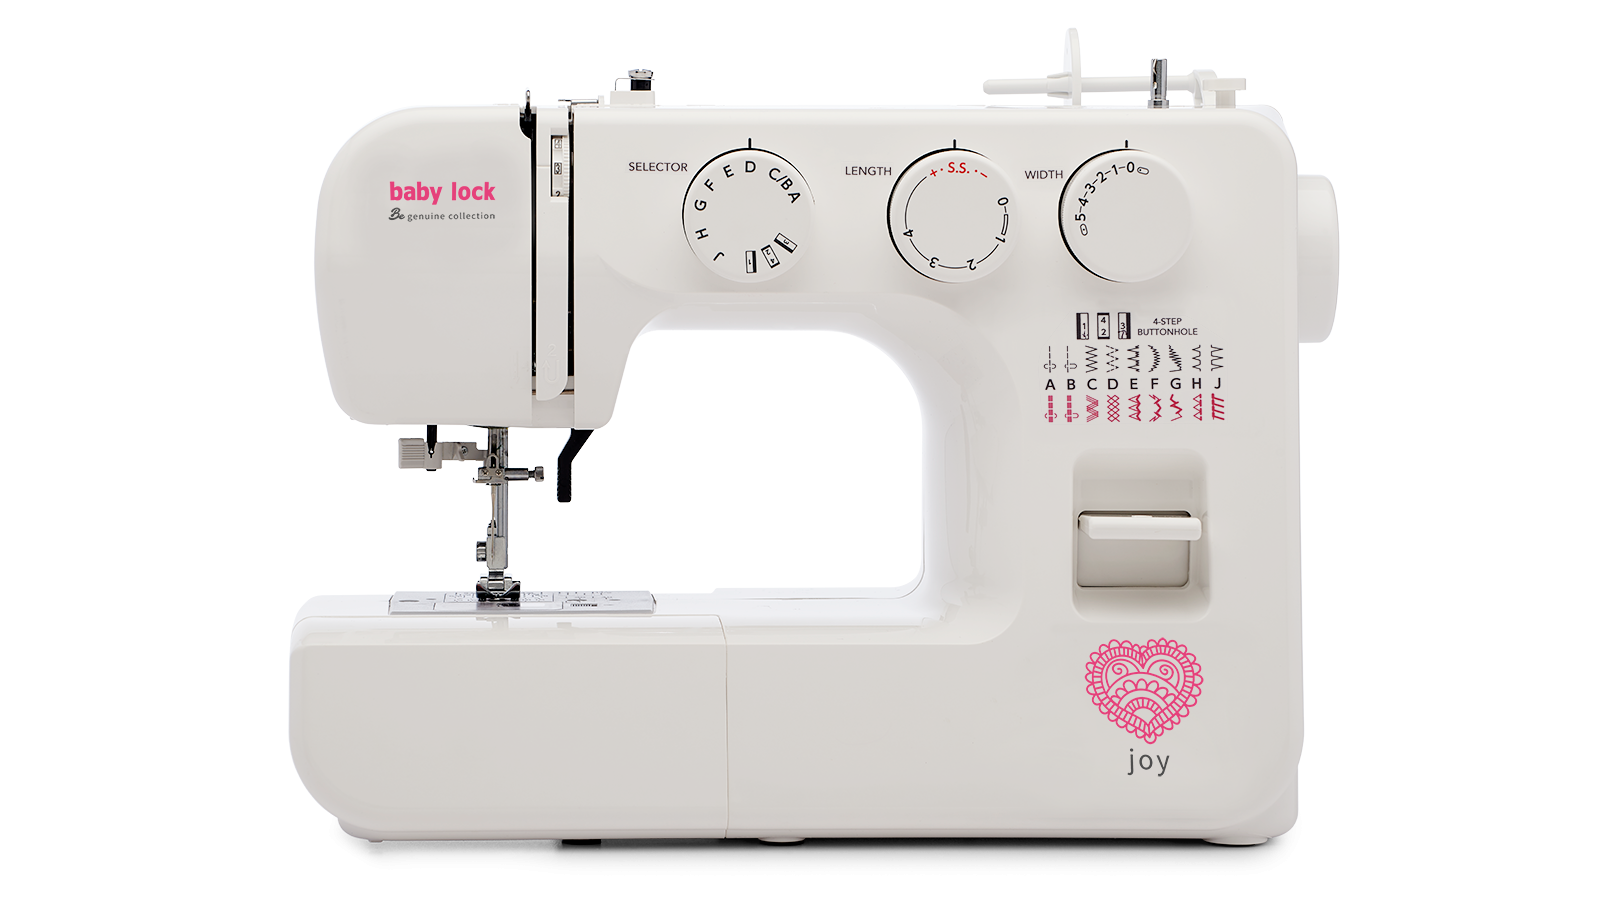 BabyLock Joy Sewing Machine - In Stock Now!